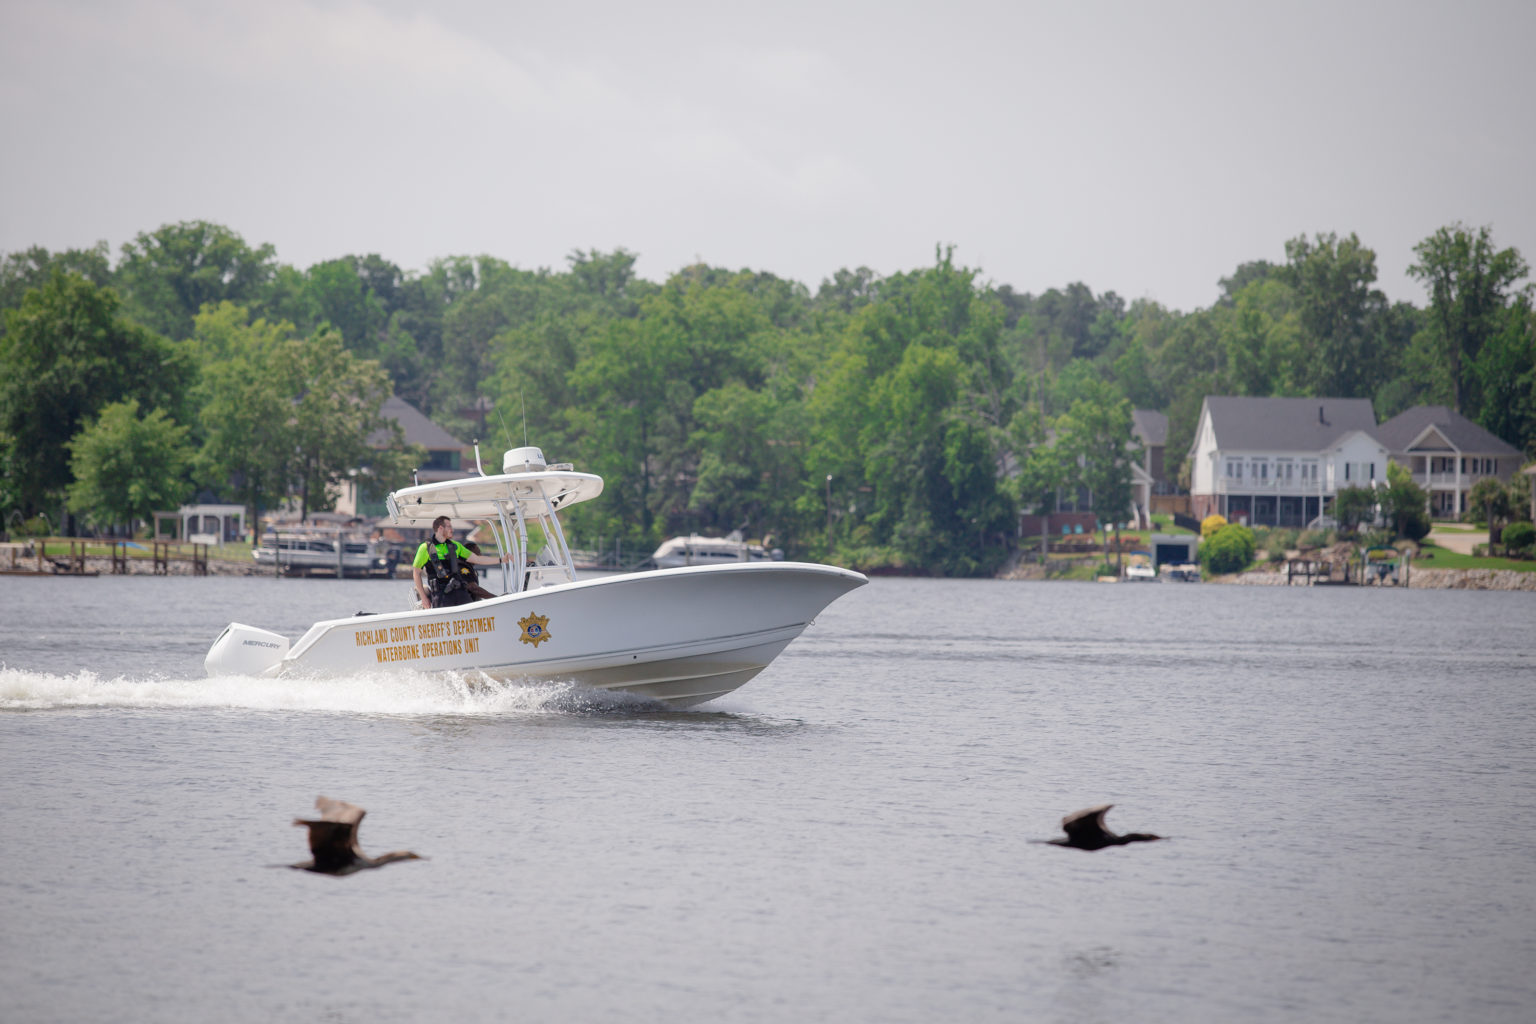 Marine Patrol Boat On The Lake